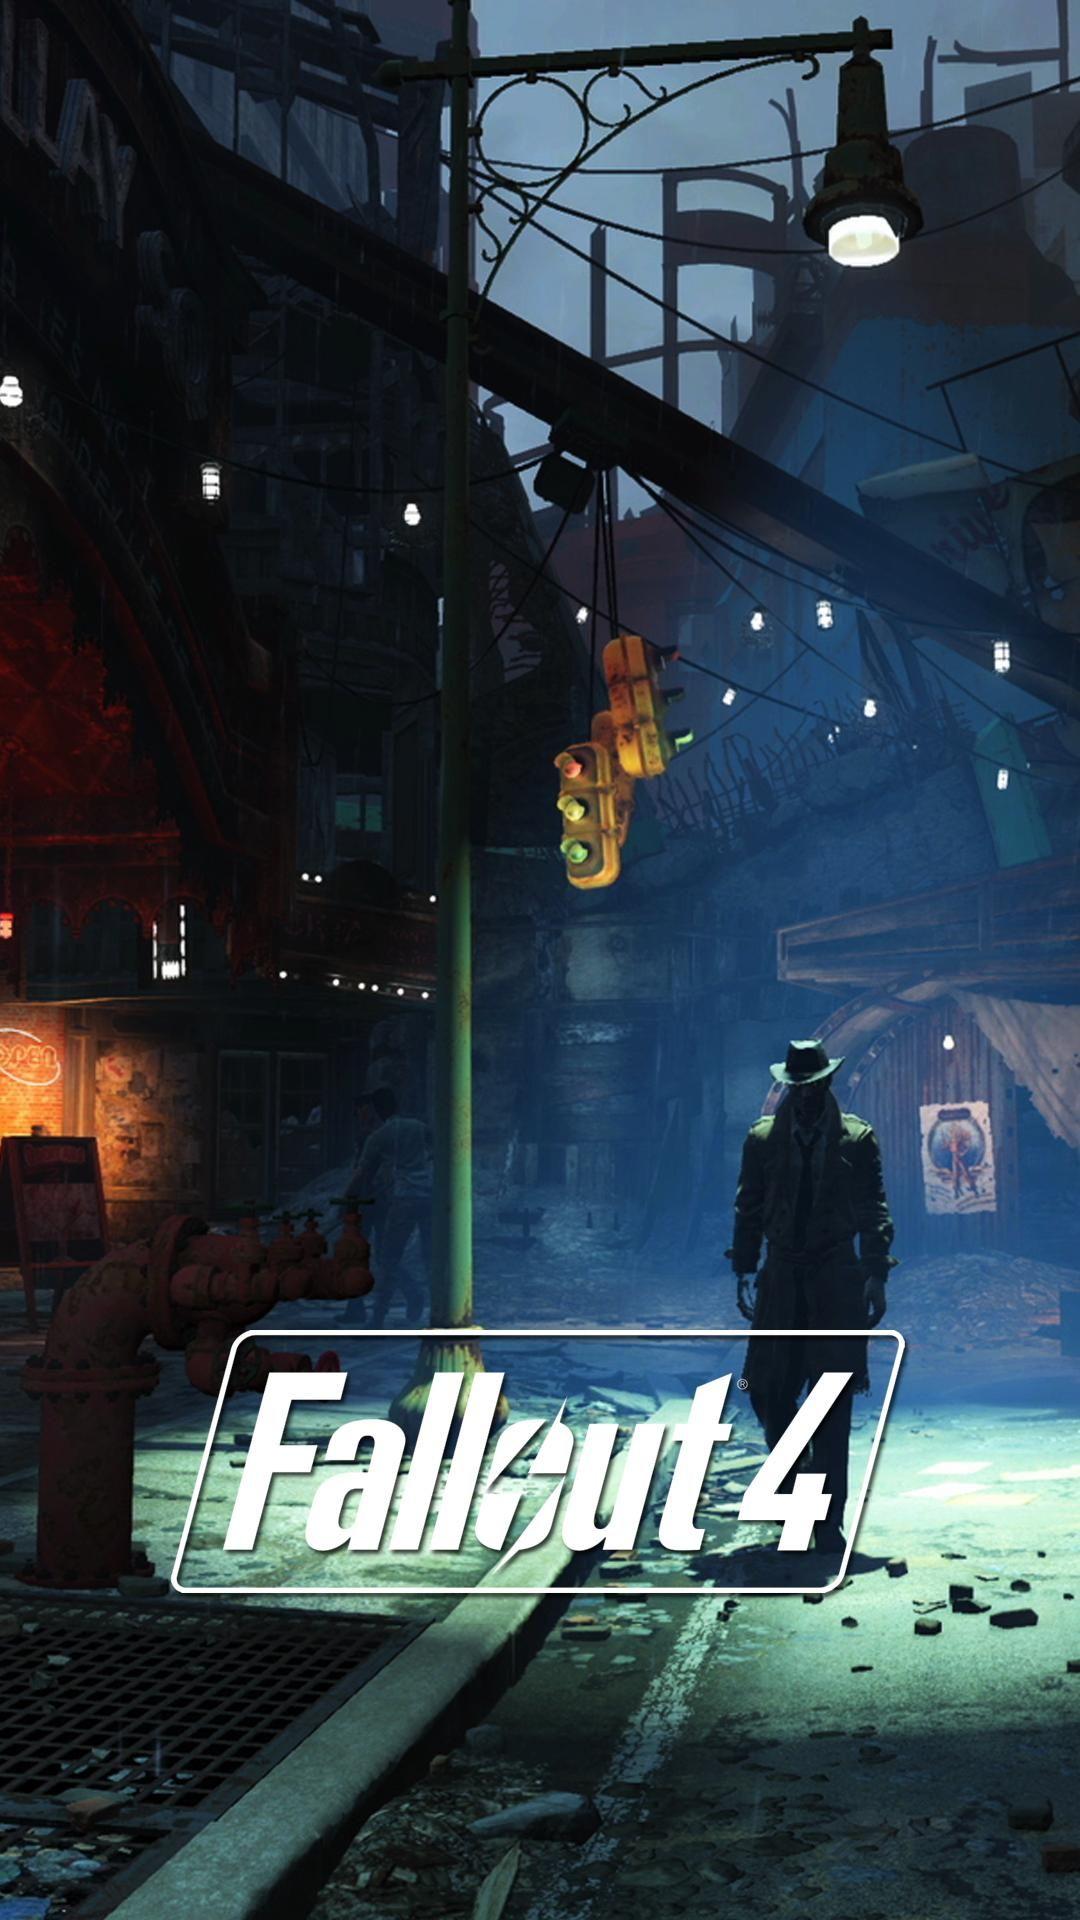 fallout 4 ls bgs   fallout 3, new vegas, and fallout 4!   fallout